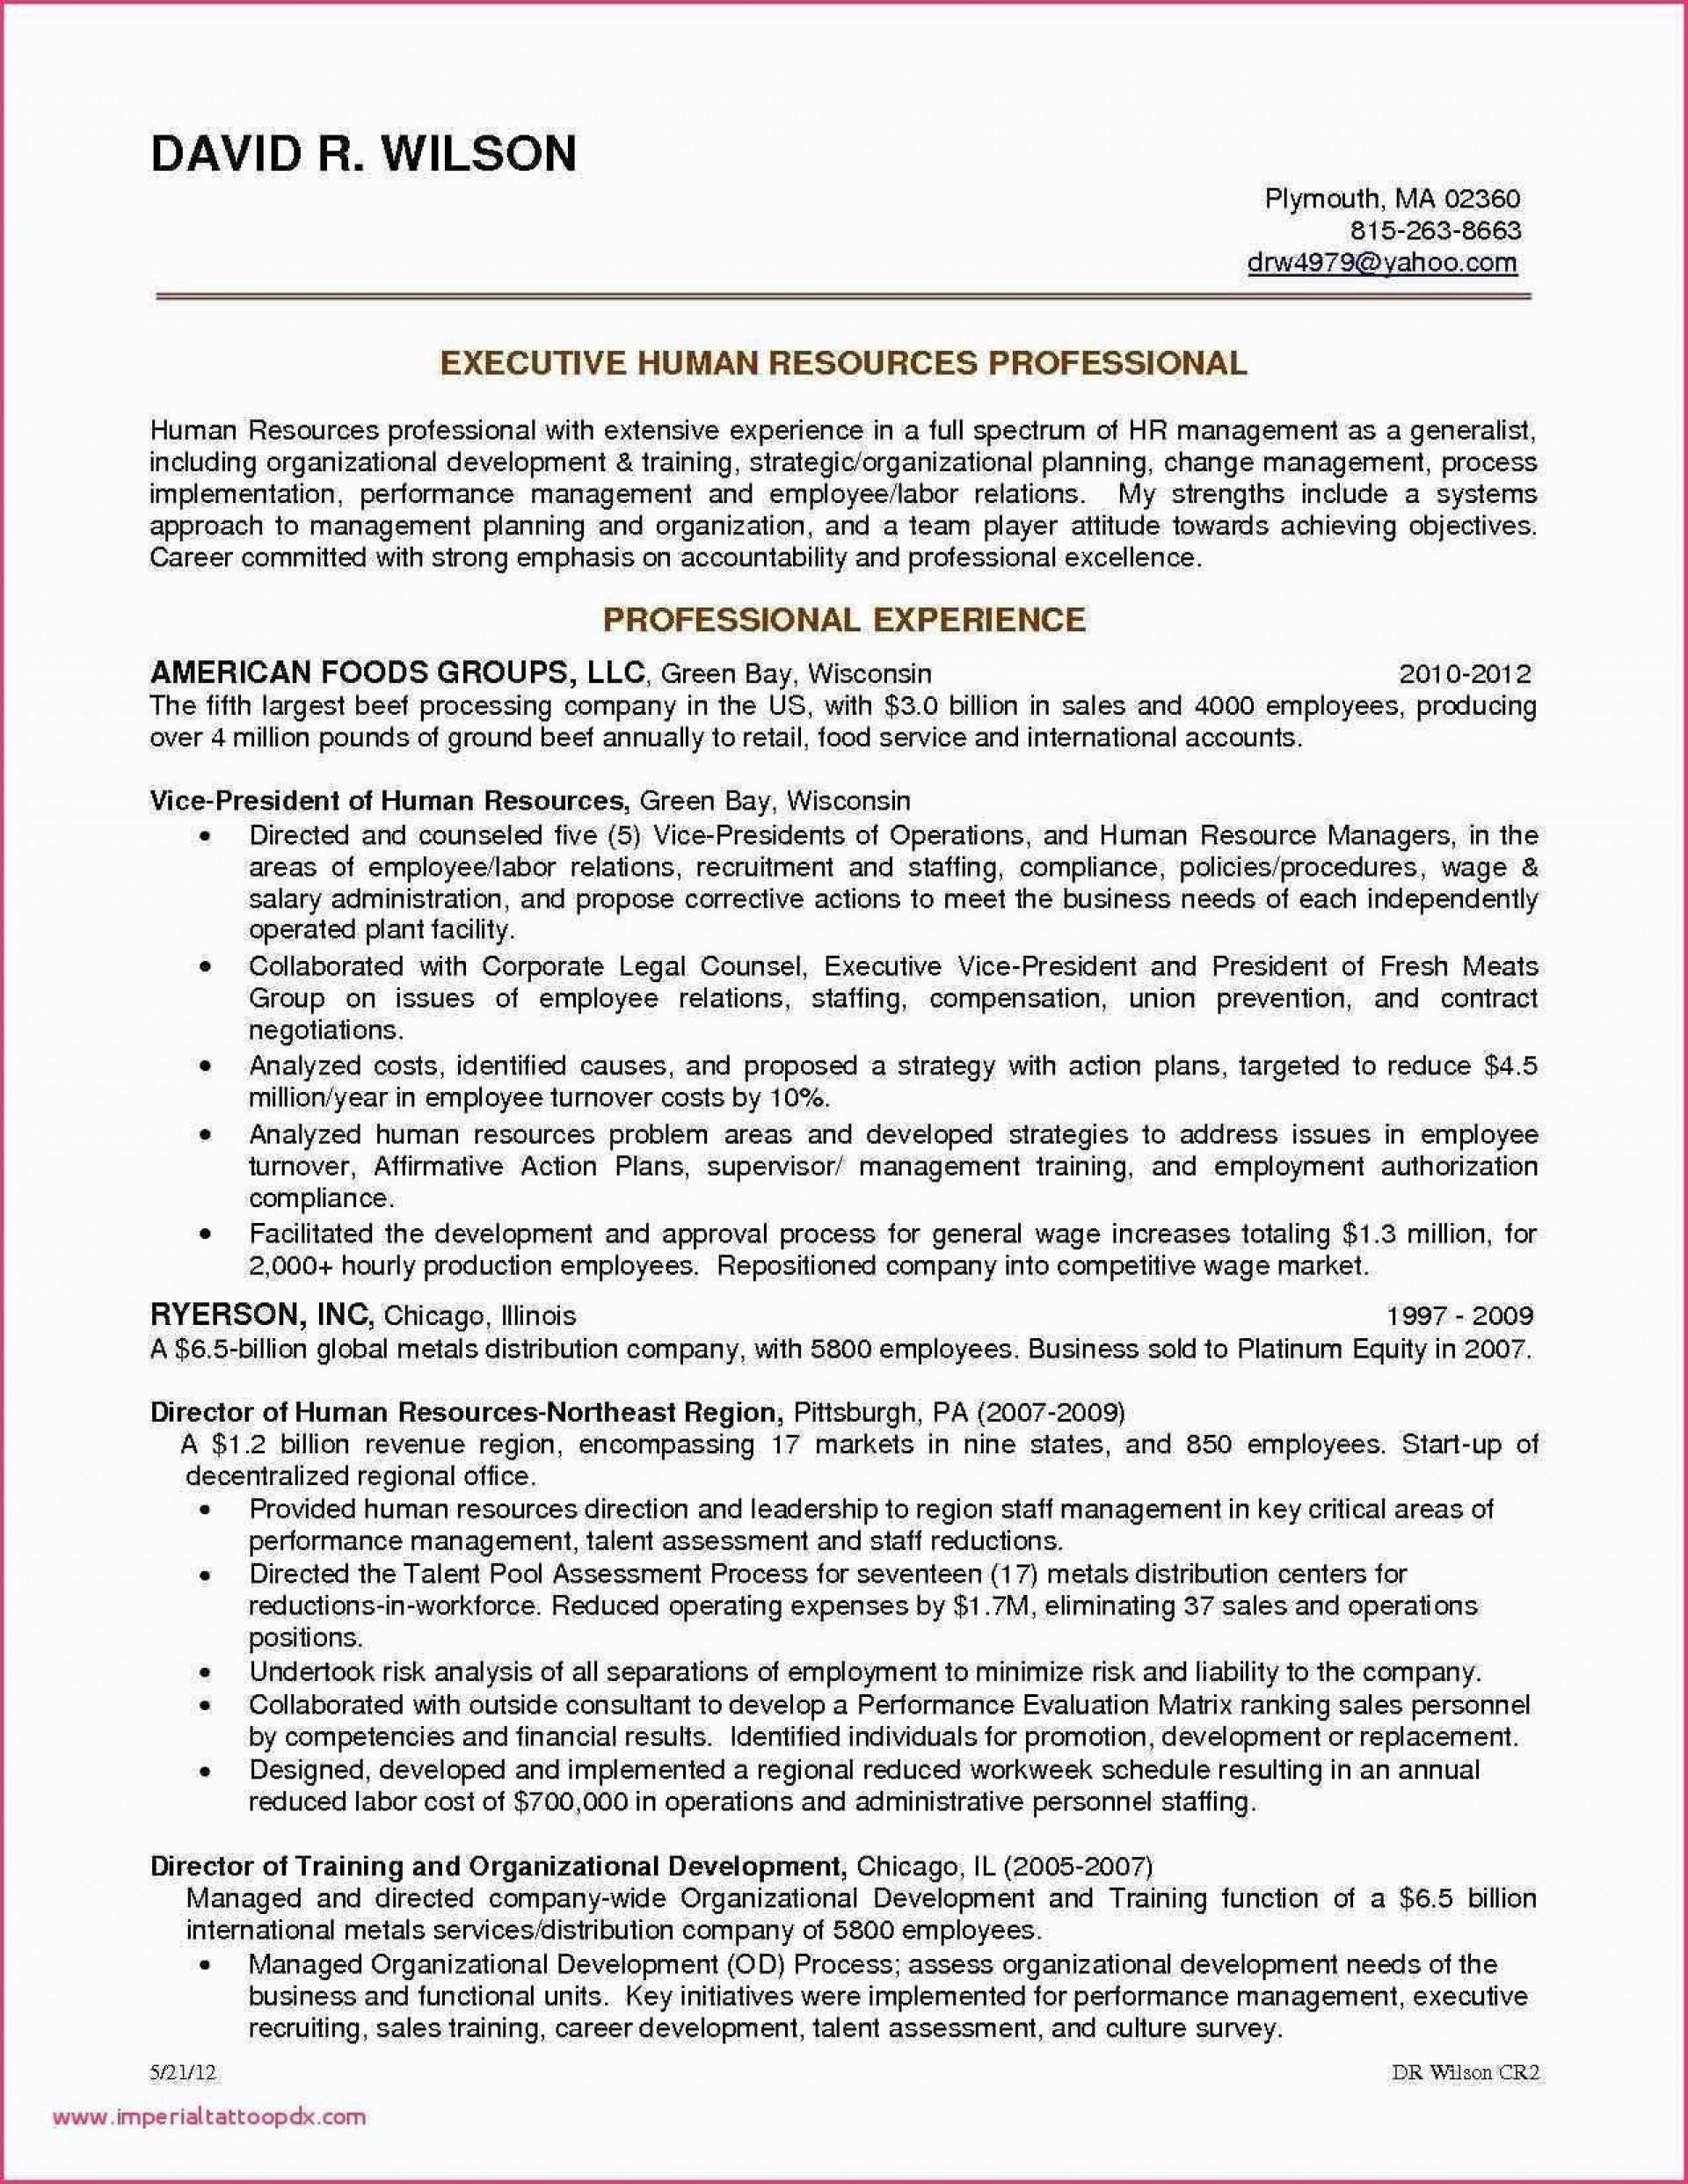 006 Sensational Professional Development Plan Template For Engineer Photo  Engineers Goal Example1920